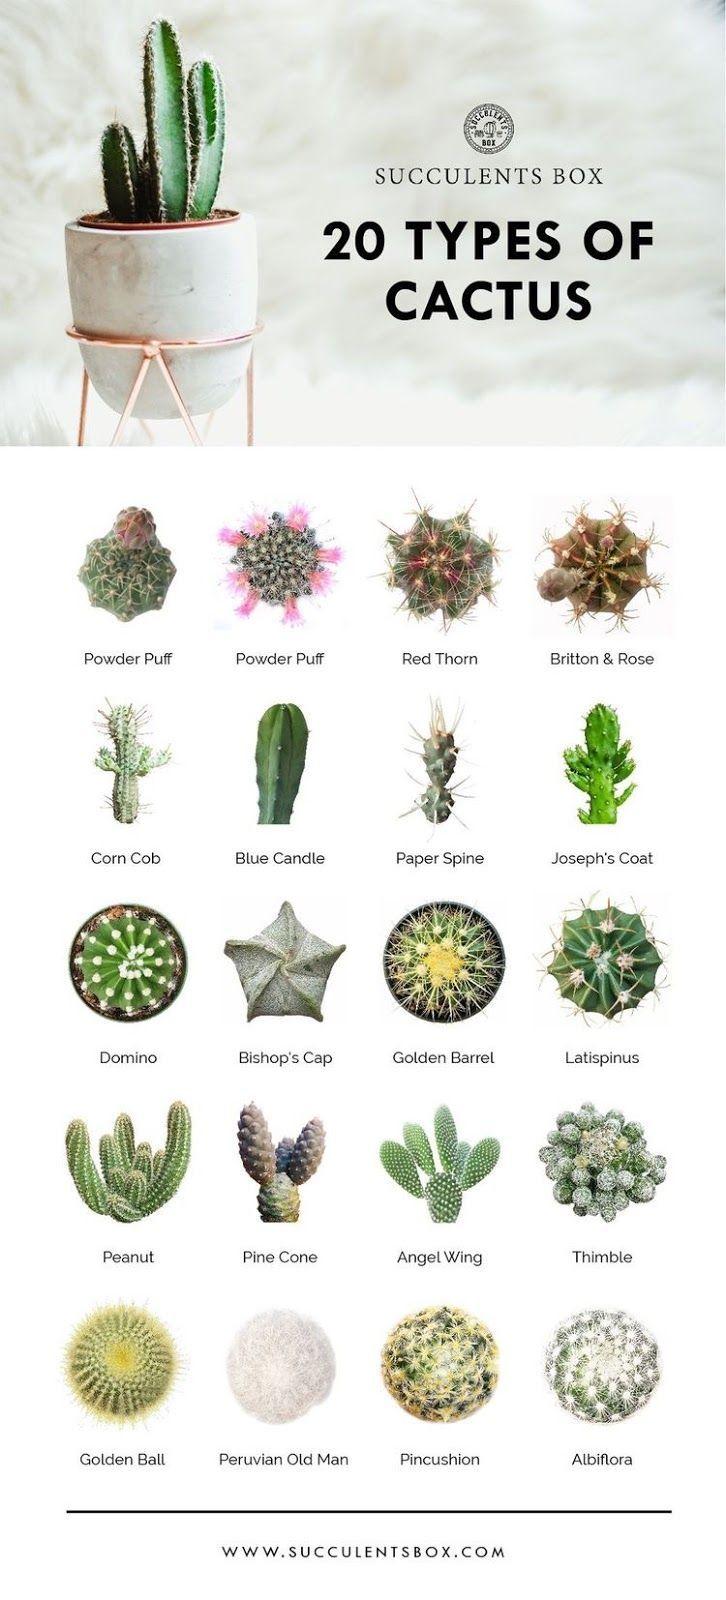 Cactus Plants Botanica Biologia In 2020 Types Of Cactus Plants